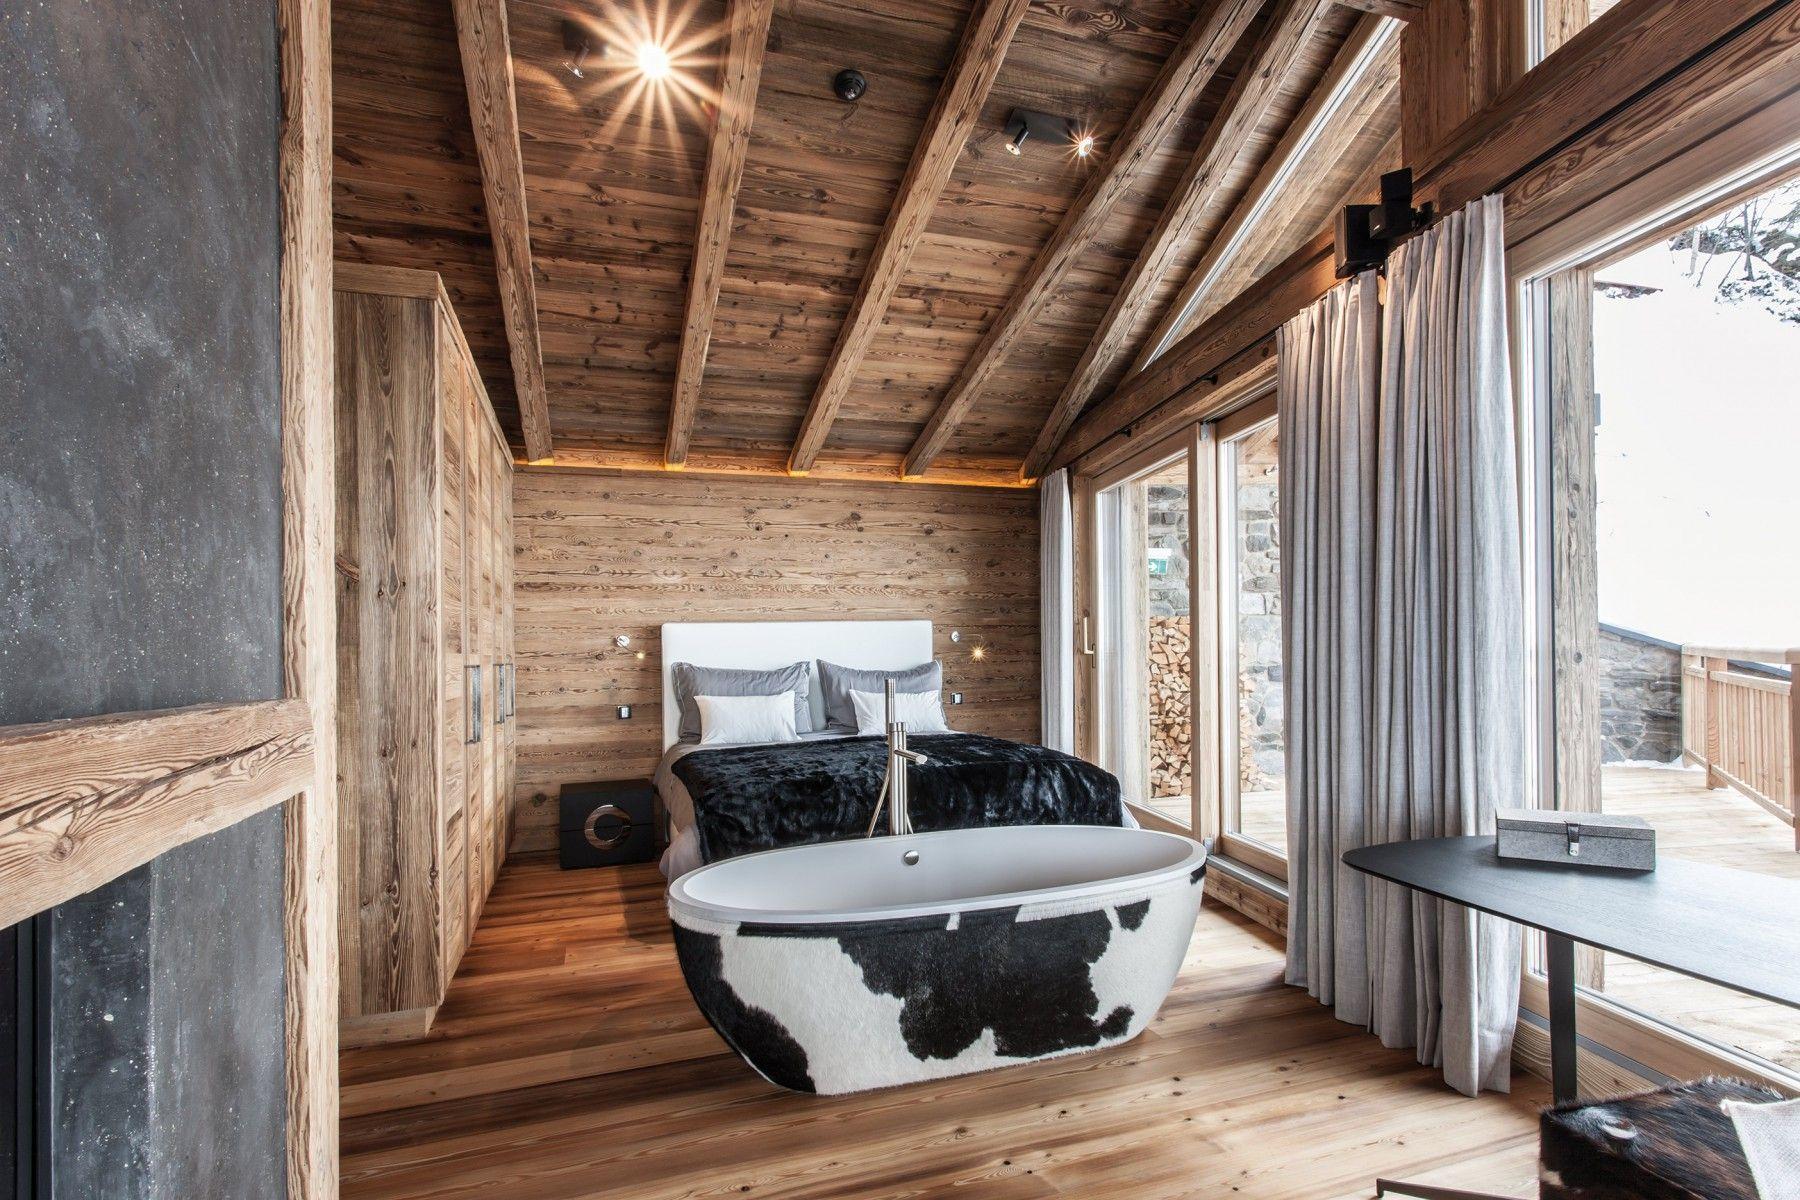 Holzfarbe Badezimmer Trends Chalet Design Rustikale Badezimmer Designs